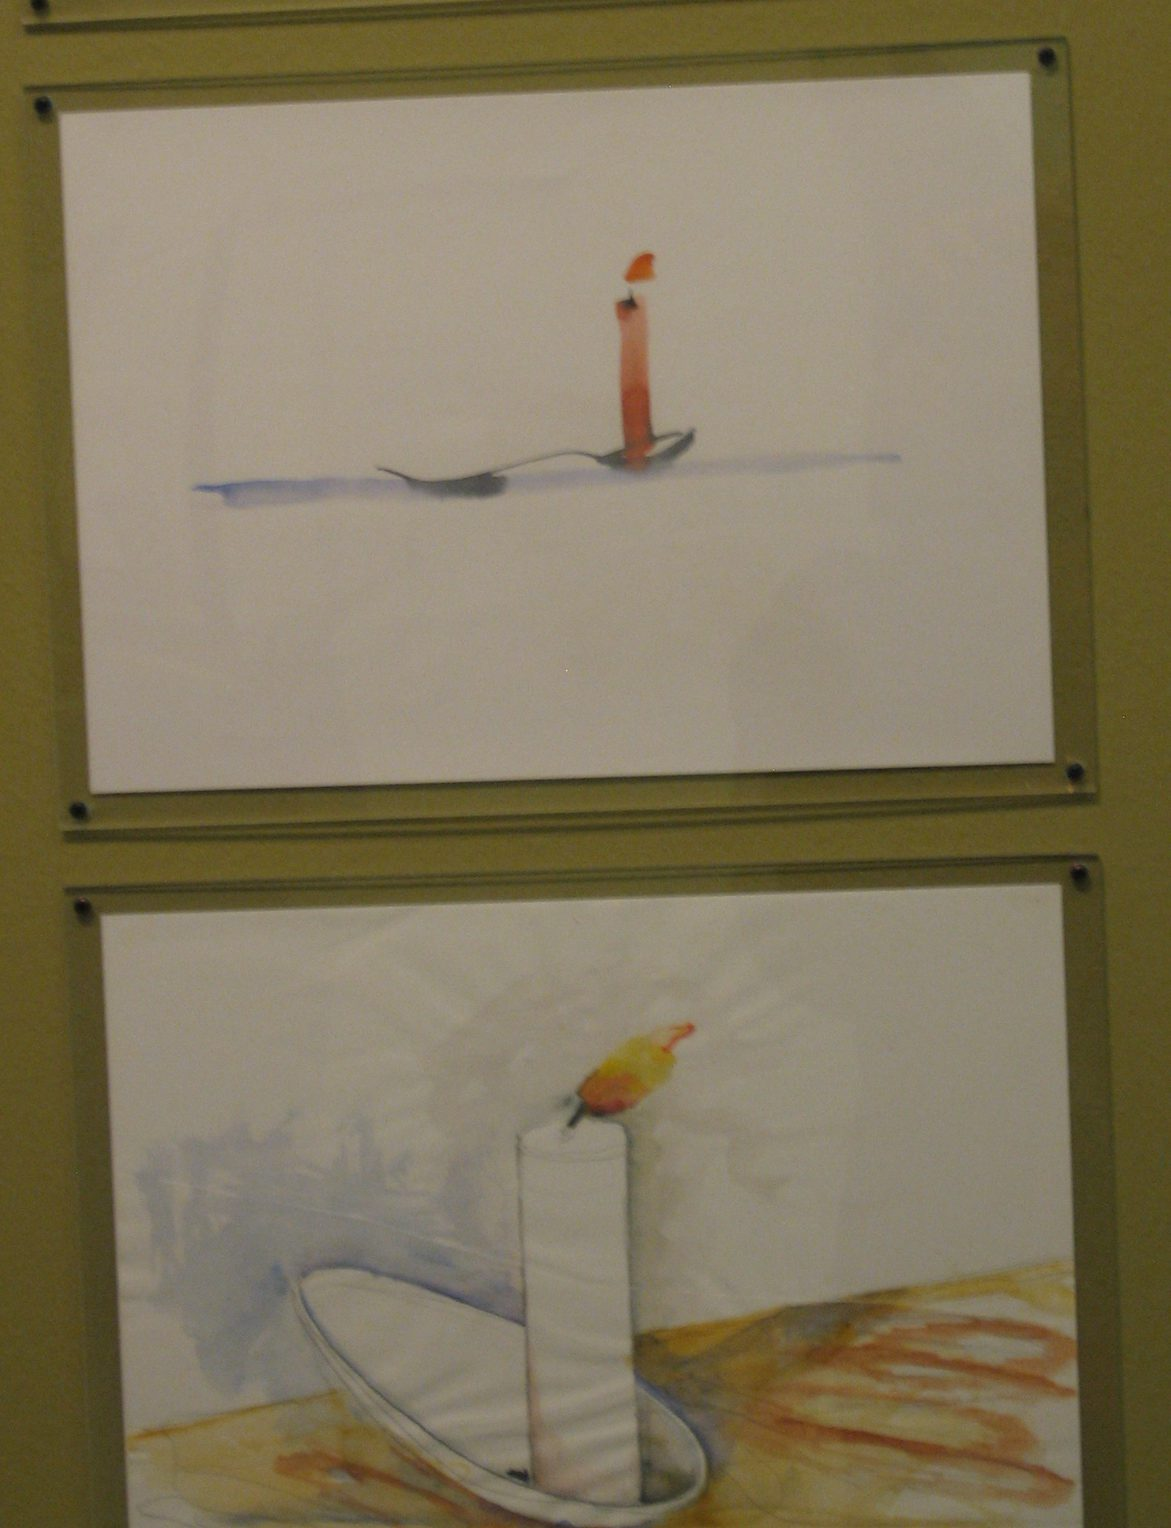 Onno Boekhoudt, tekening. Werk in uitvoering, CODA, 2010, papier, verf